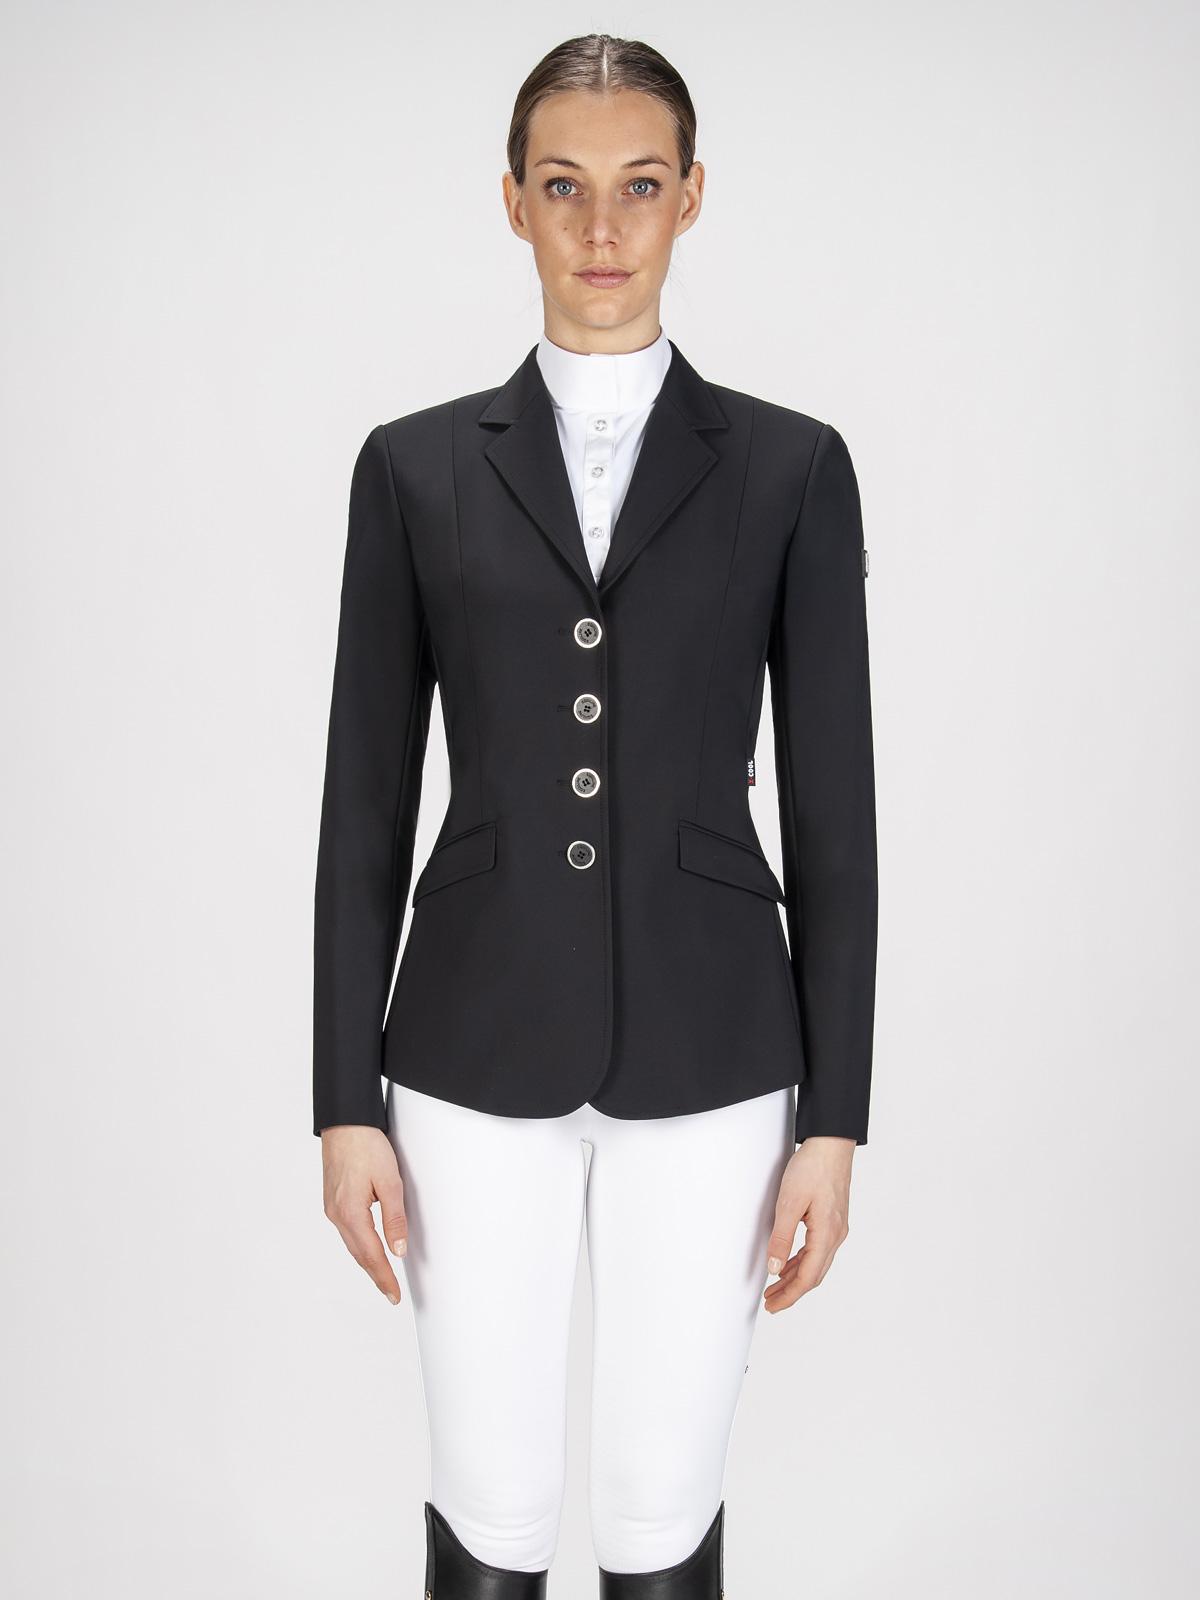 Gait women's show coat in X-Cool Evo performance fabric black